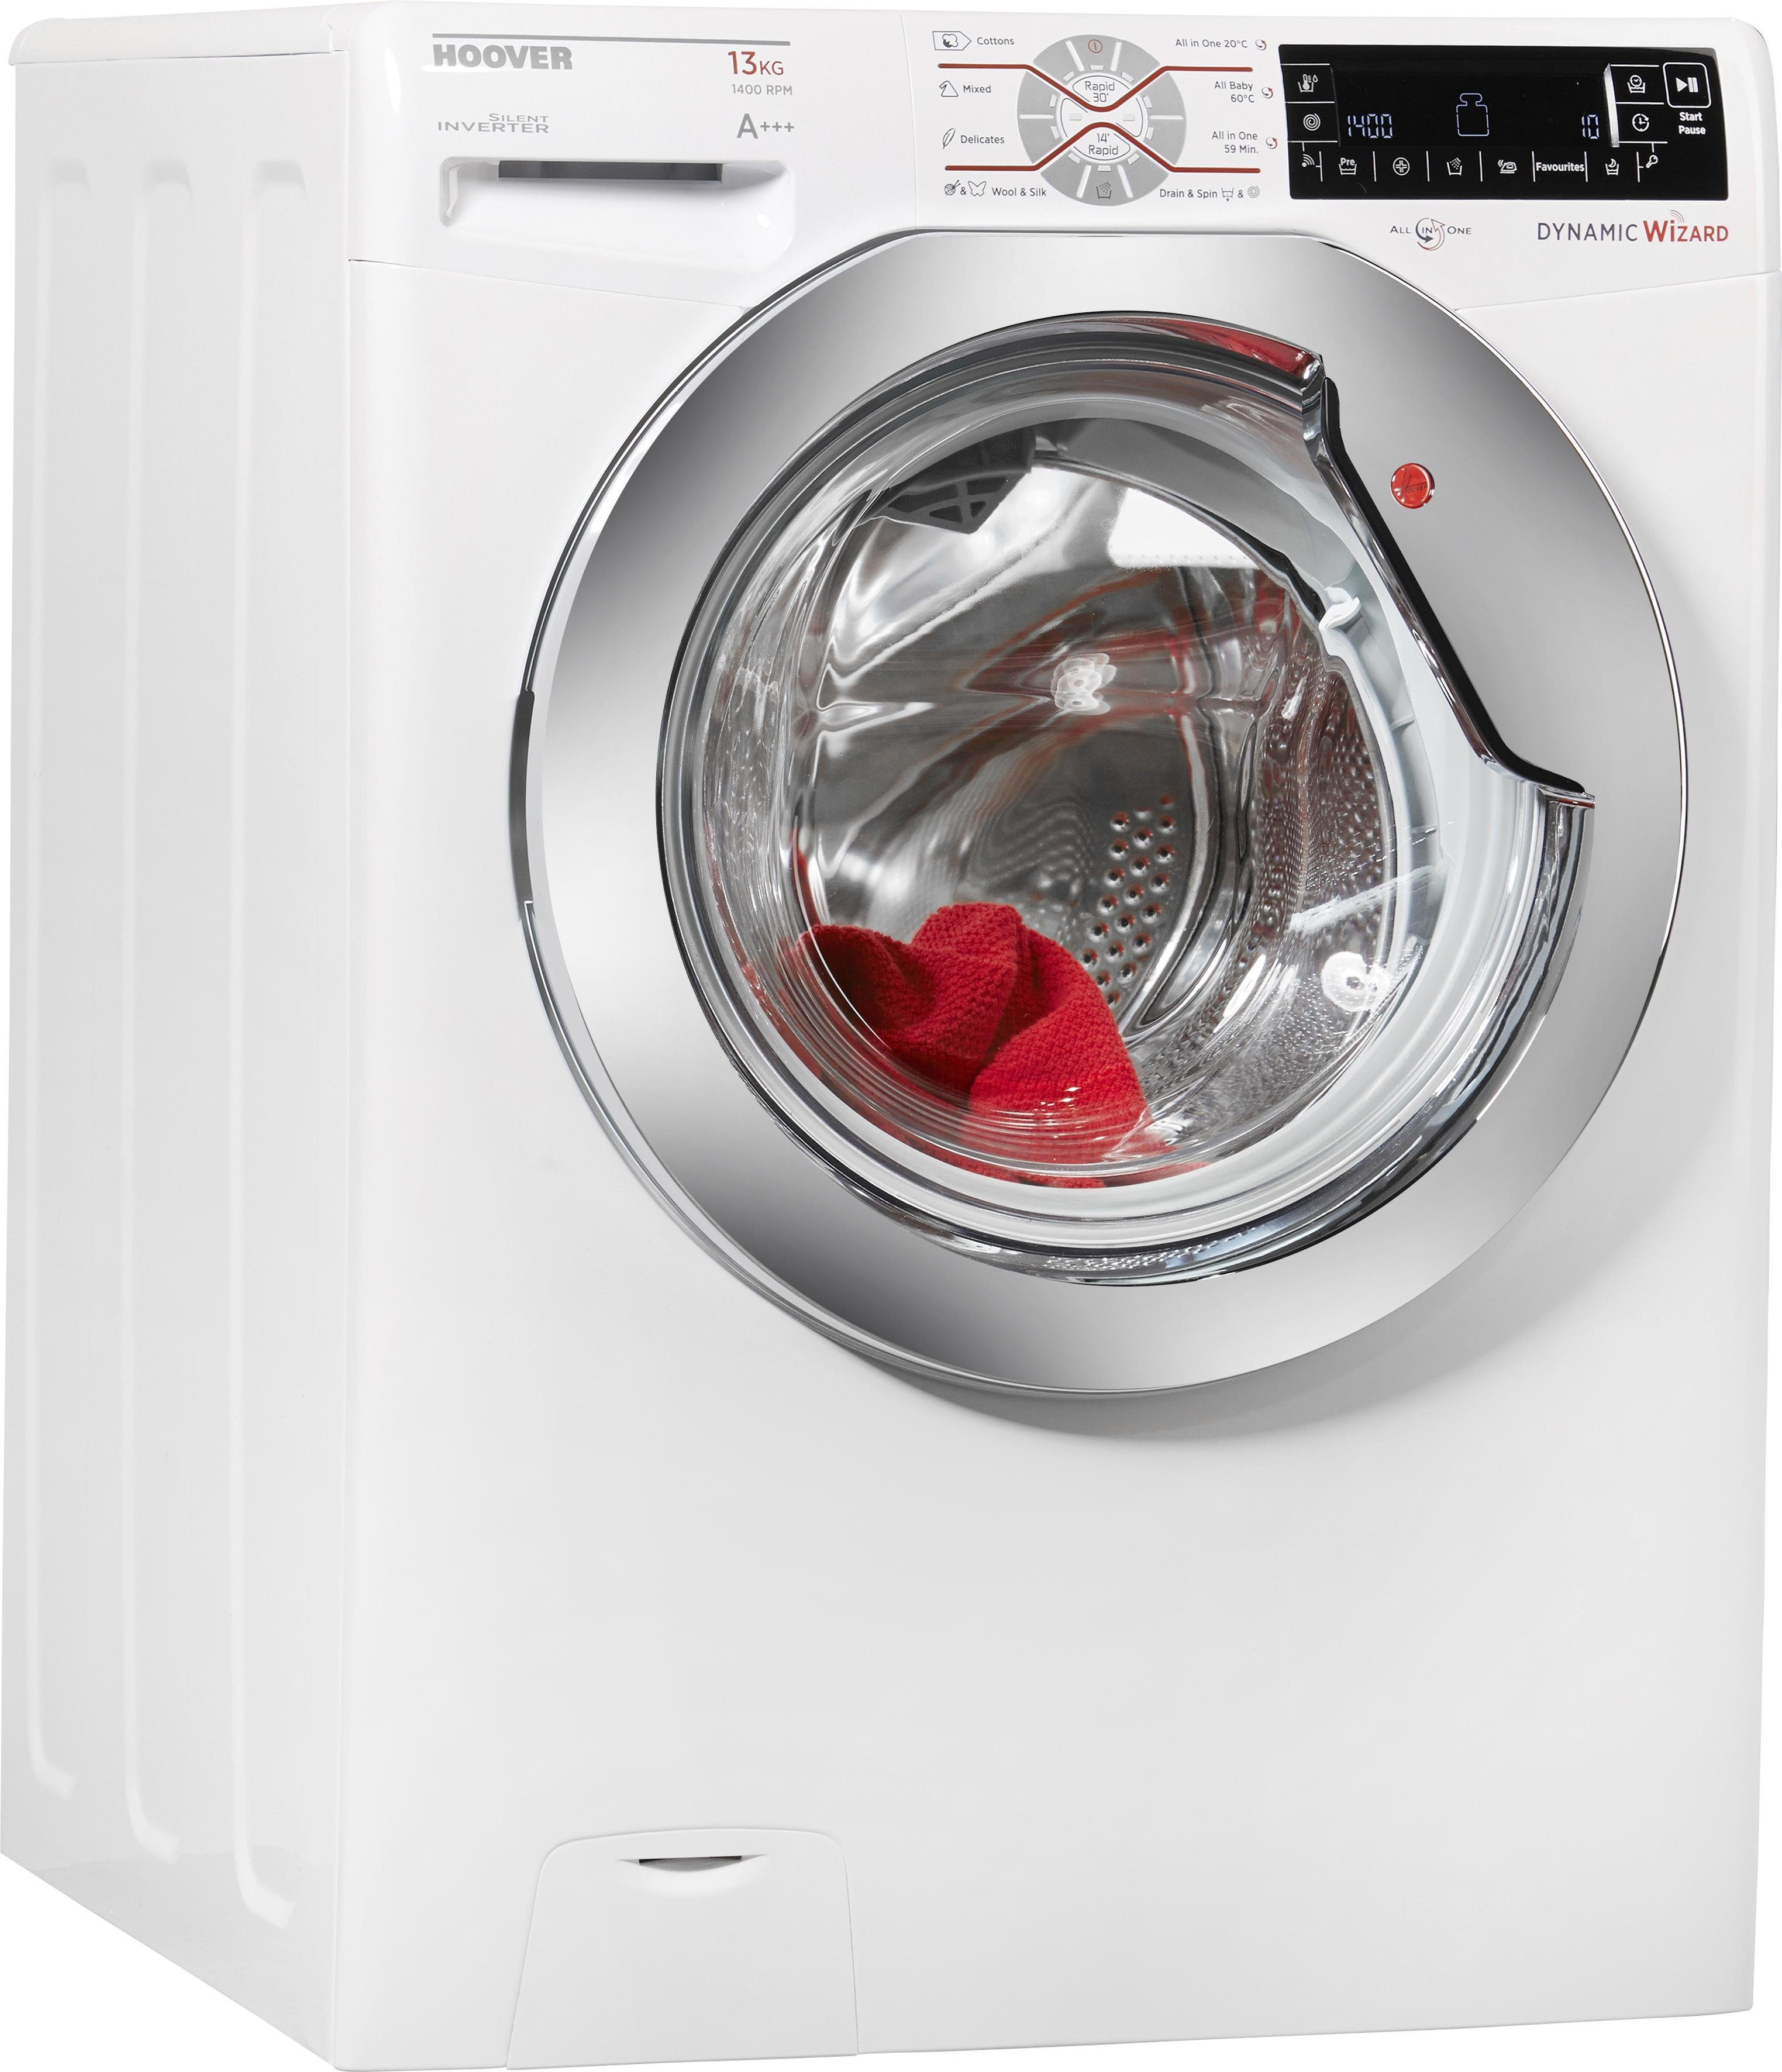 Hoover Waschmaschine DWT 413 AH, A+++, 13 kg, 1400 U/Min